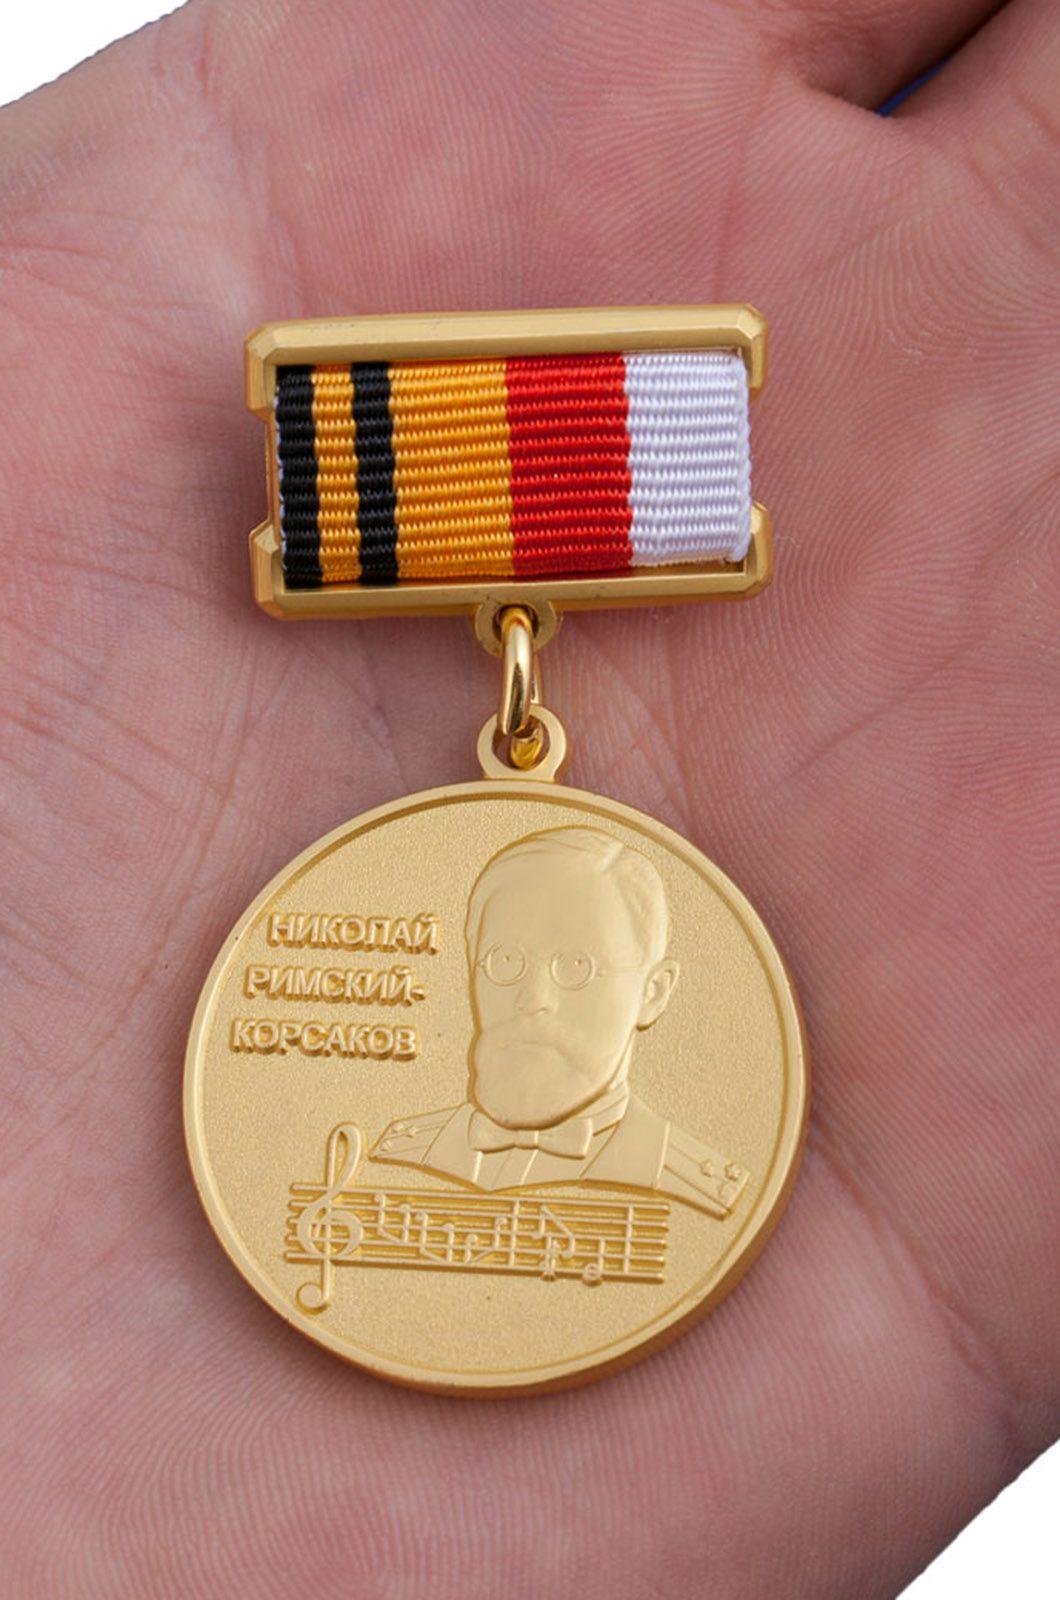 Знак Николай Римский-Корсаков МО России - вид на ладони